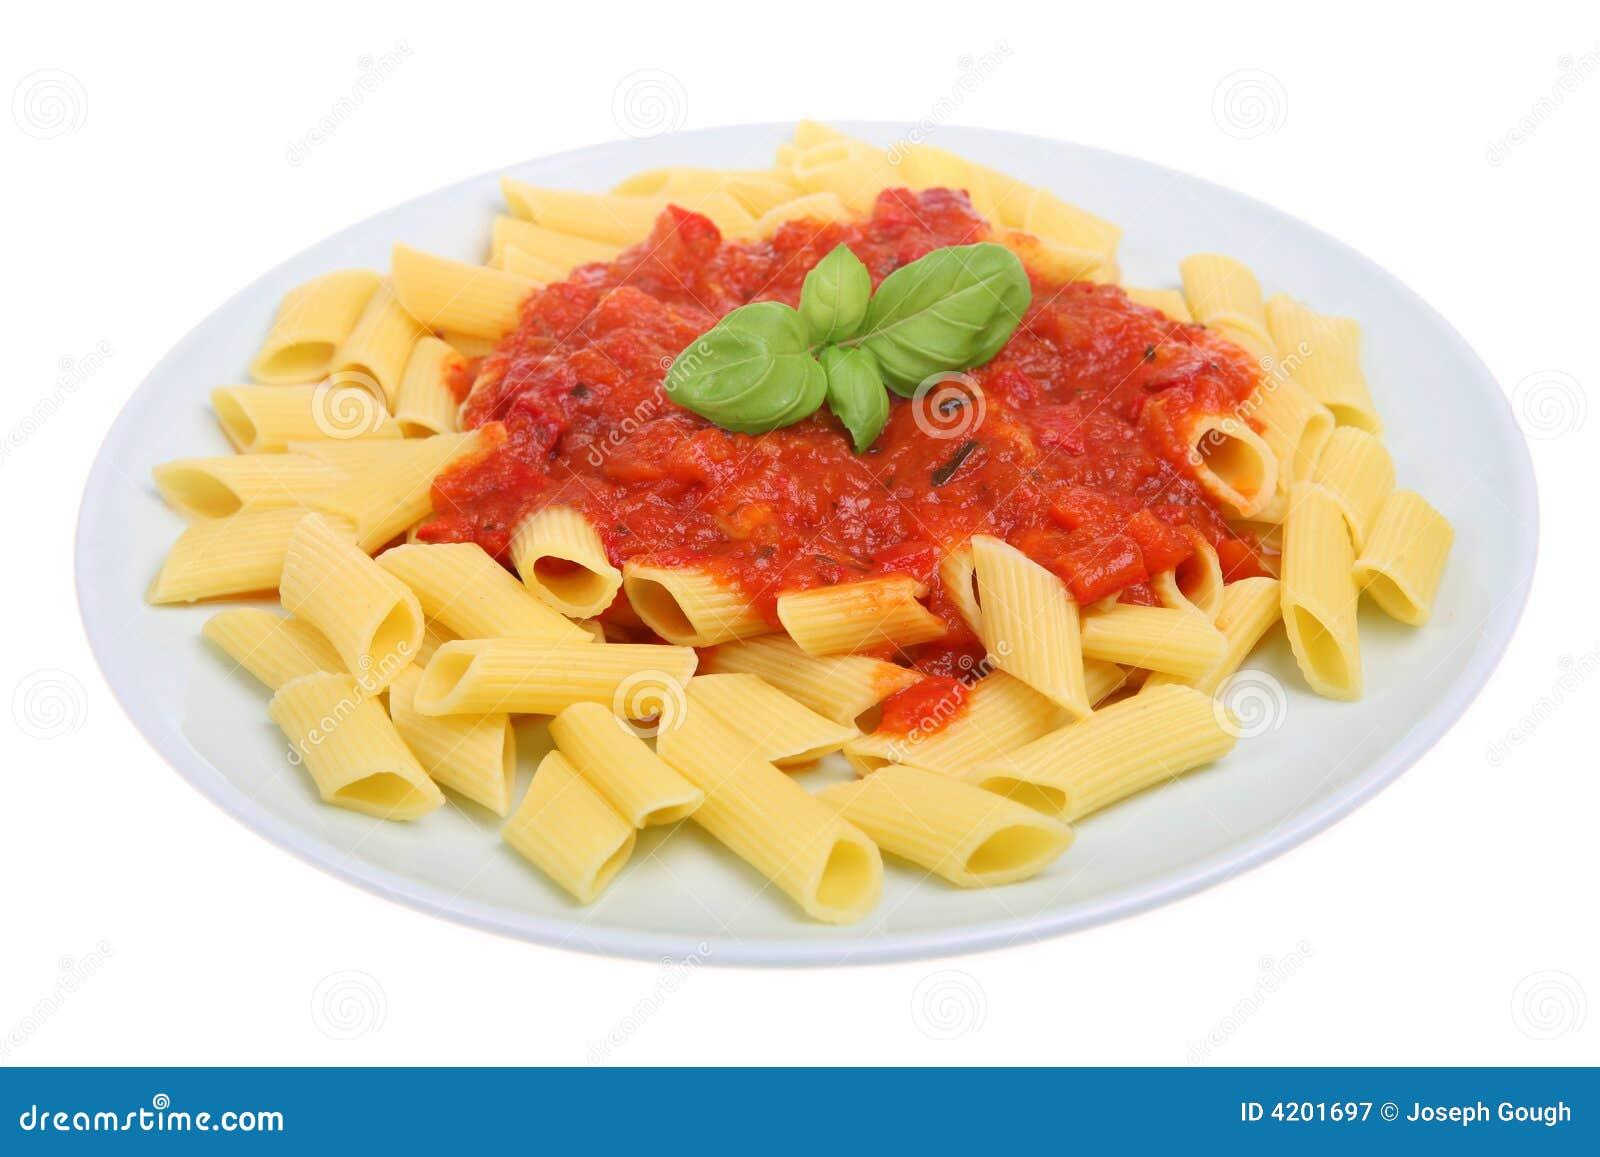 Simple rigatoni pasta dish with tomato sauce.